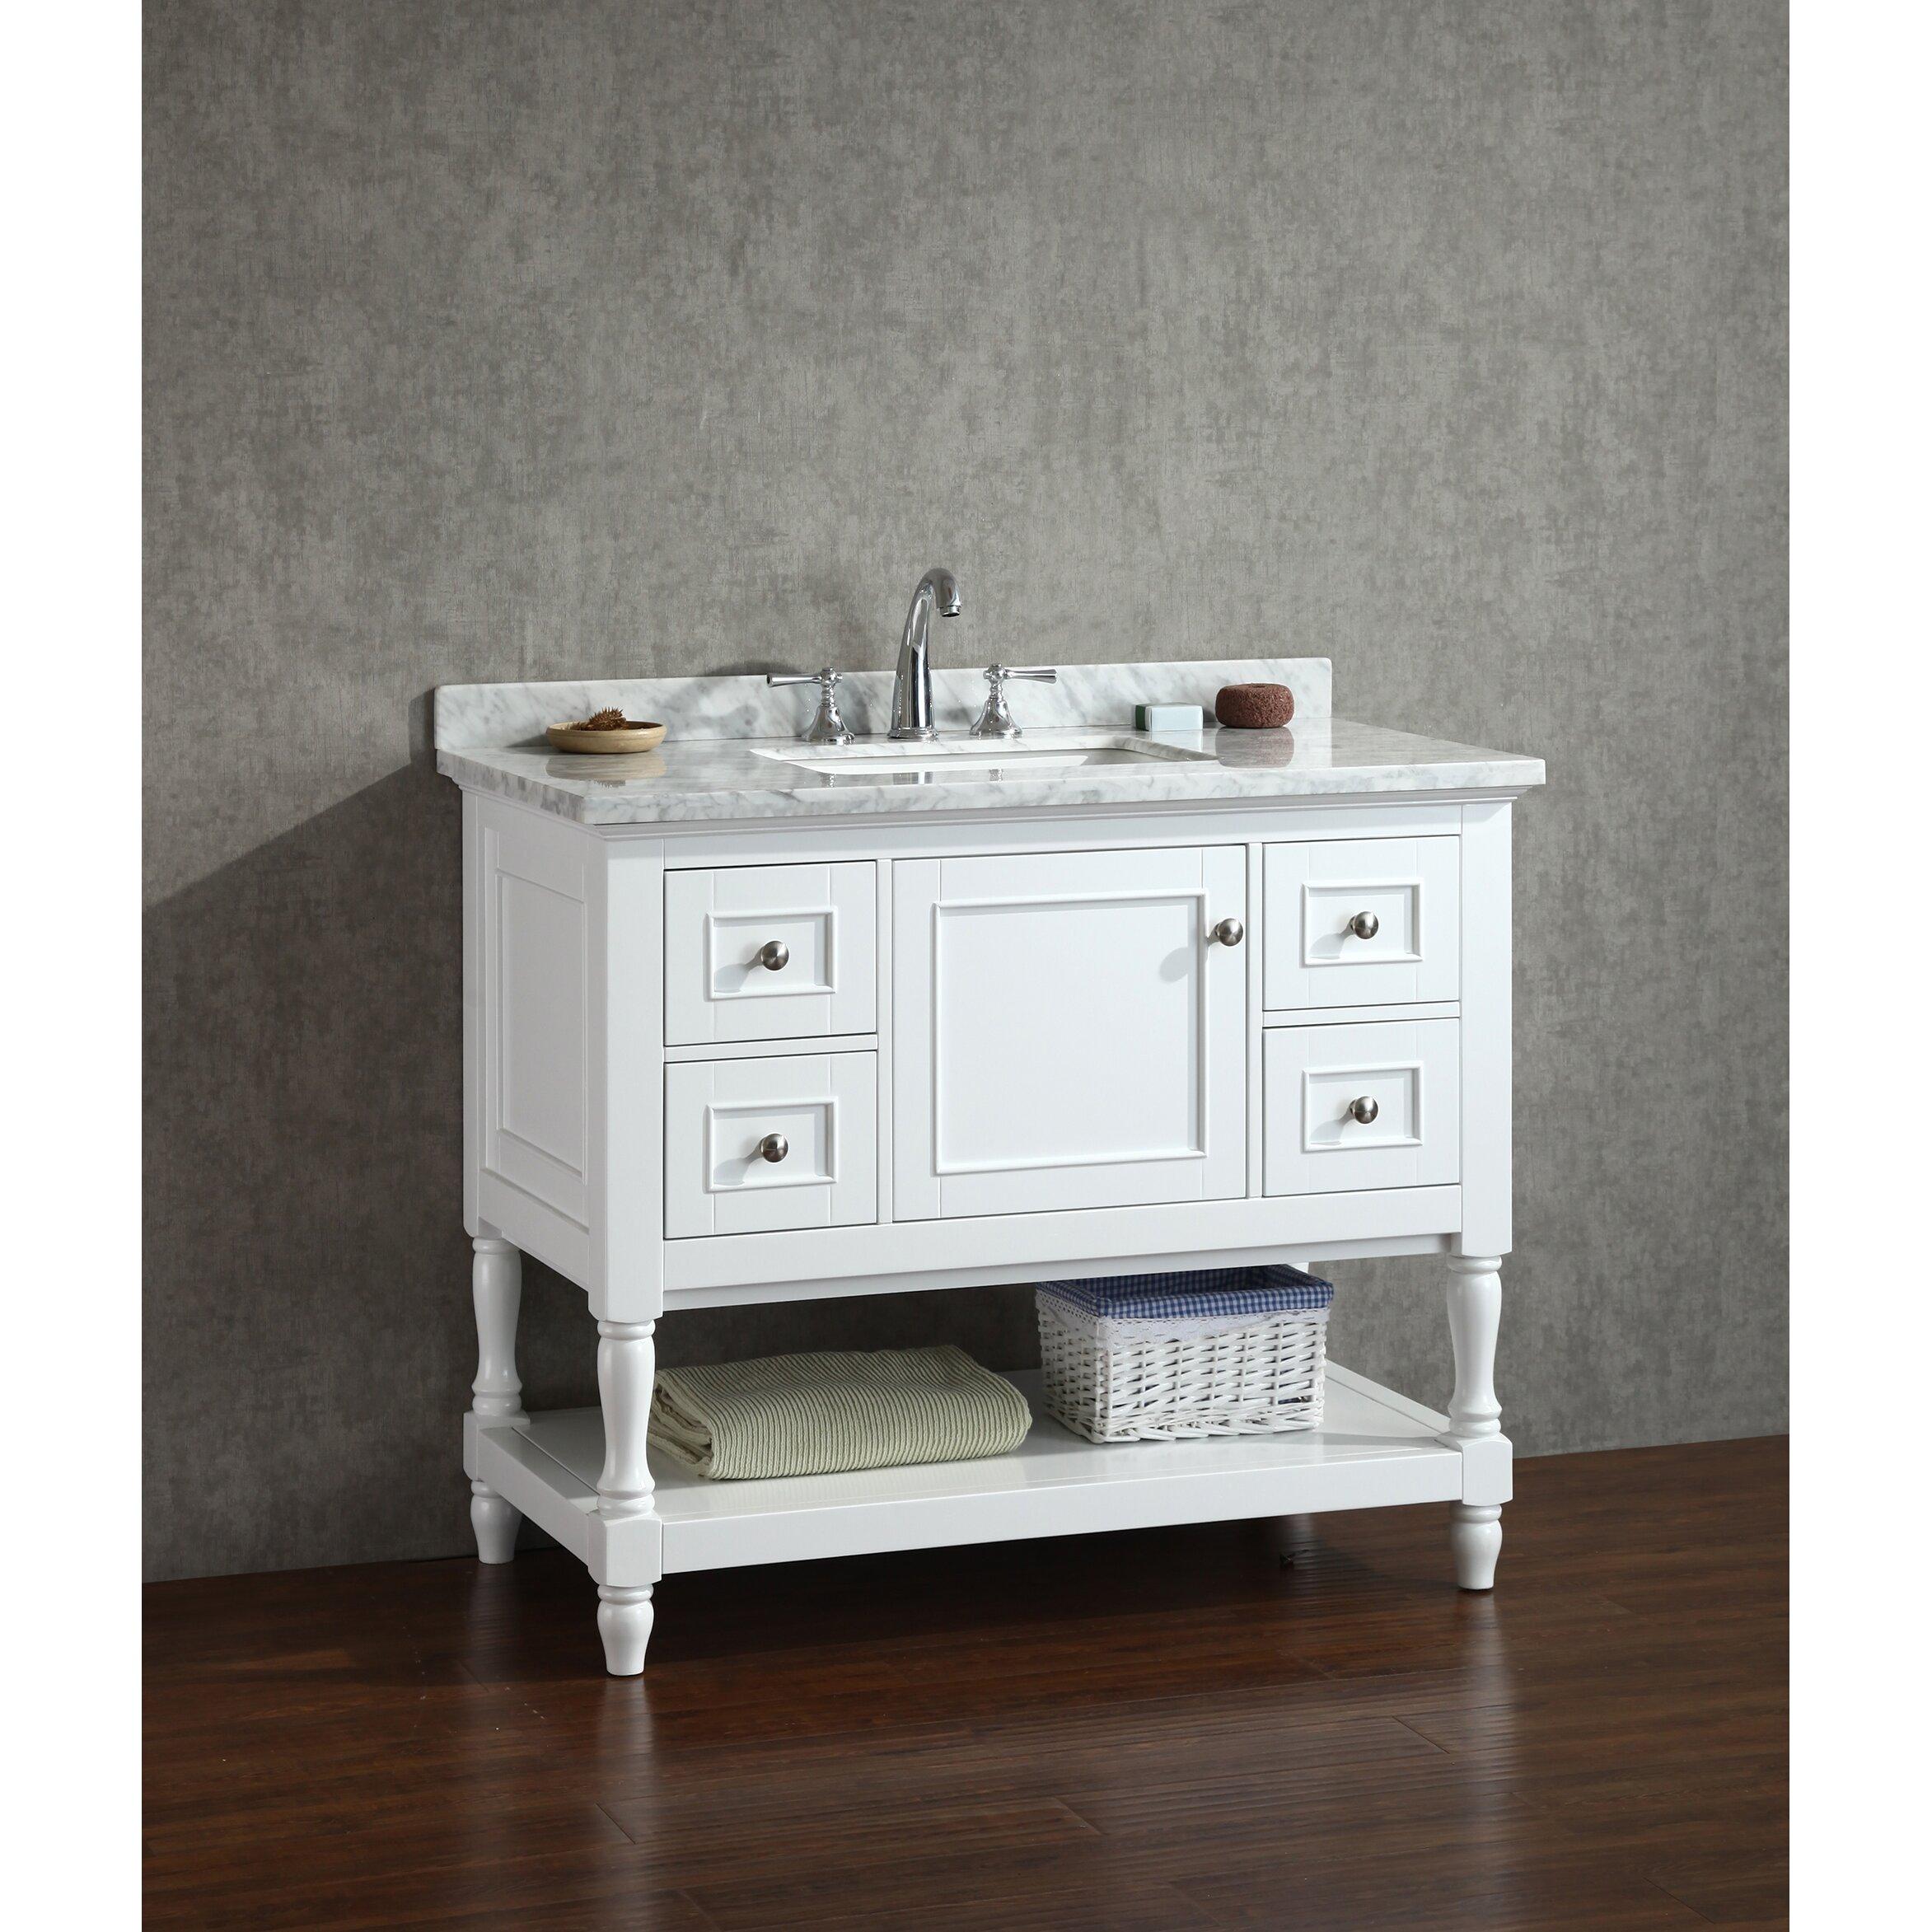 Cape Cod Bathroom Vanity And Mirror White 42 Shop Ari Kitchen and ...